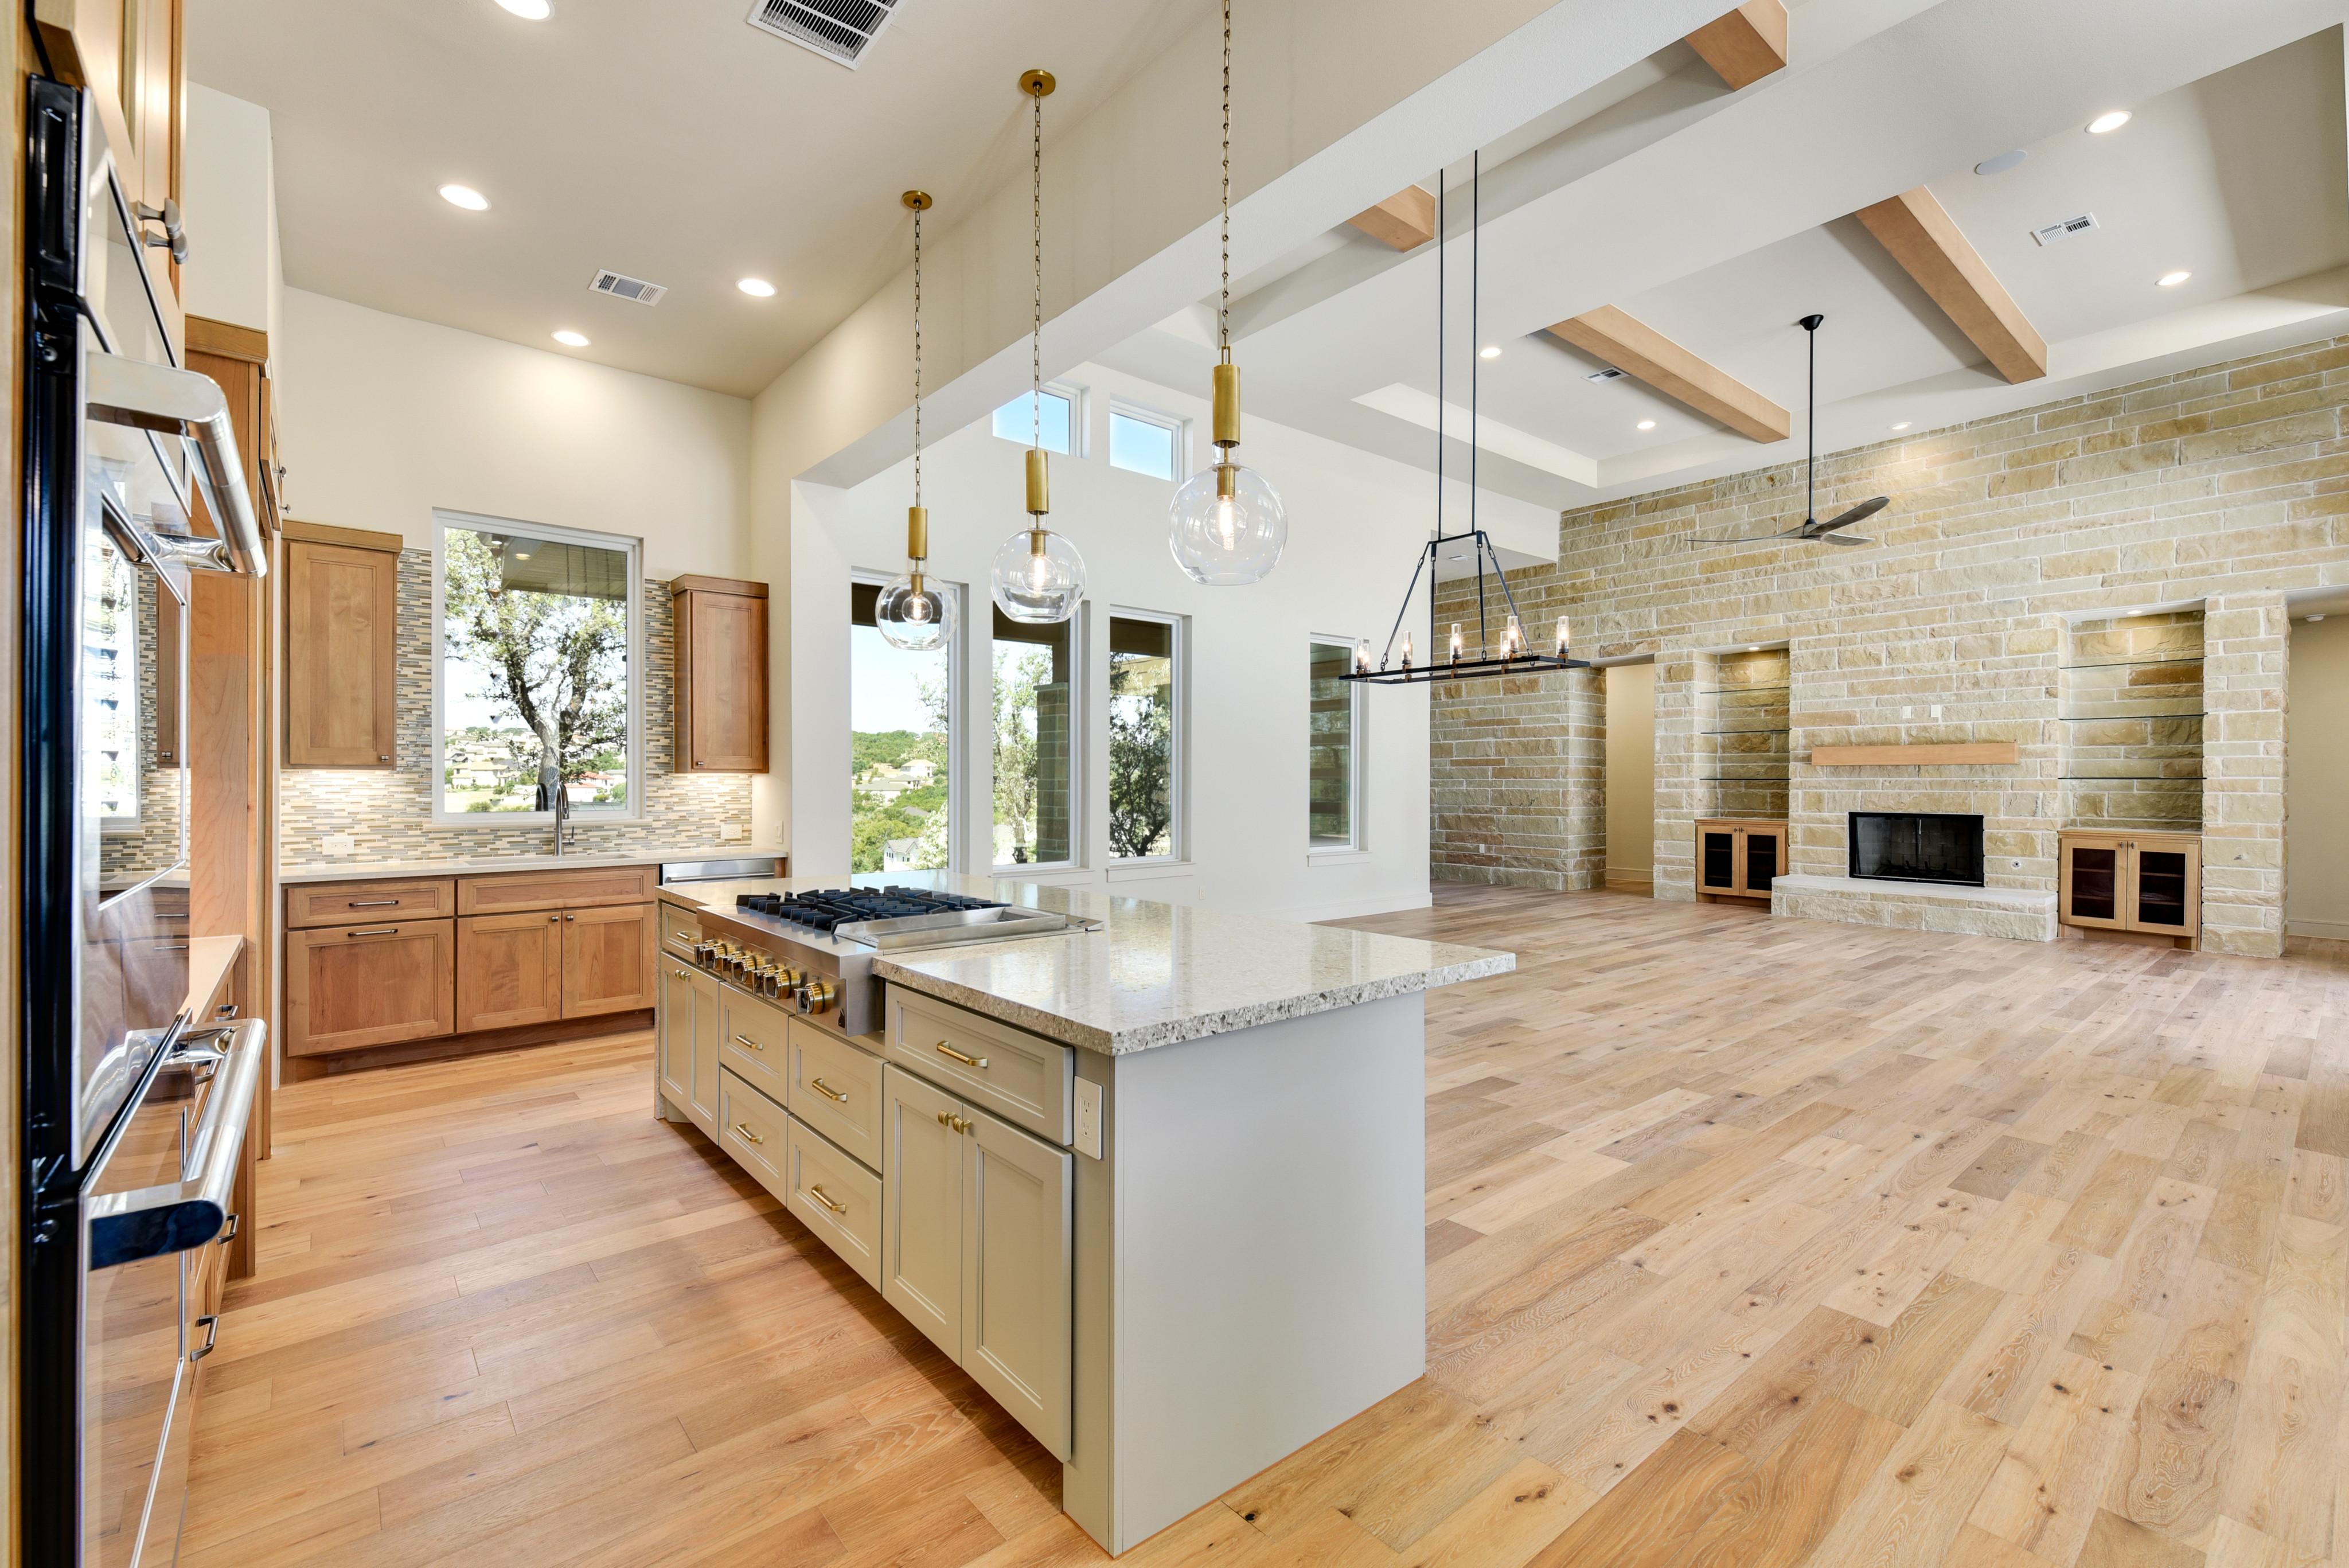 orig_109 Stephanie Lane kitchen.jpg